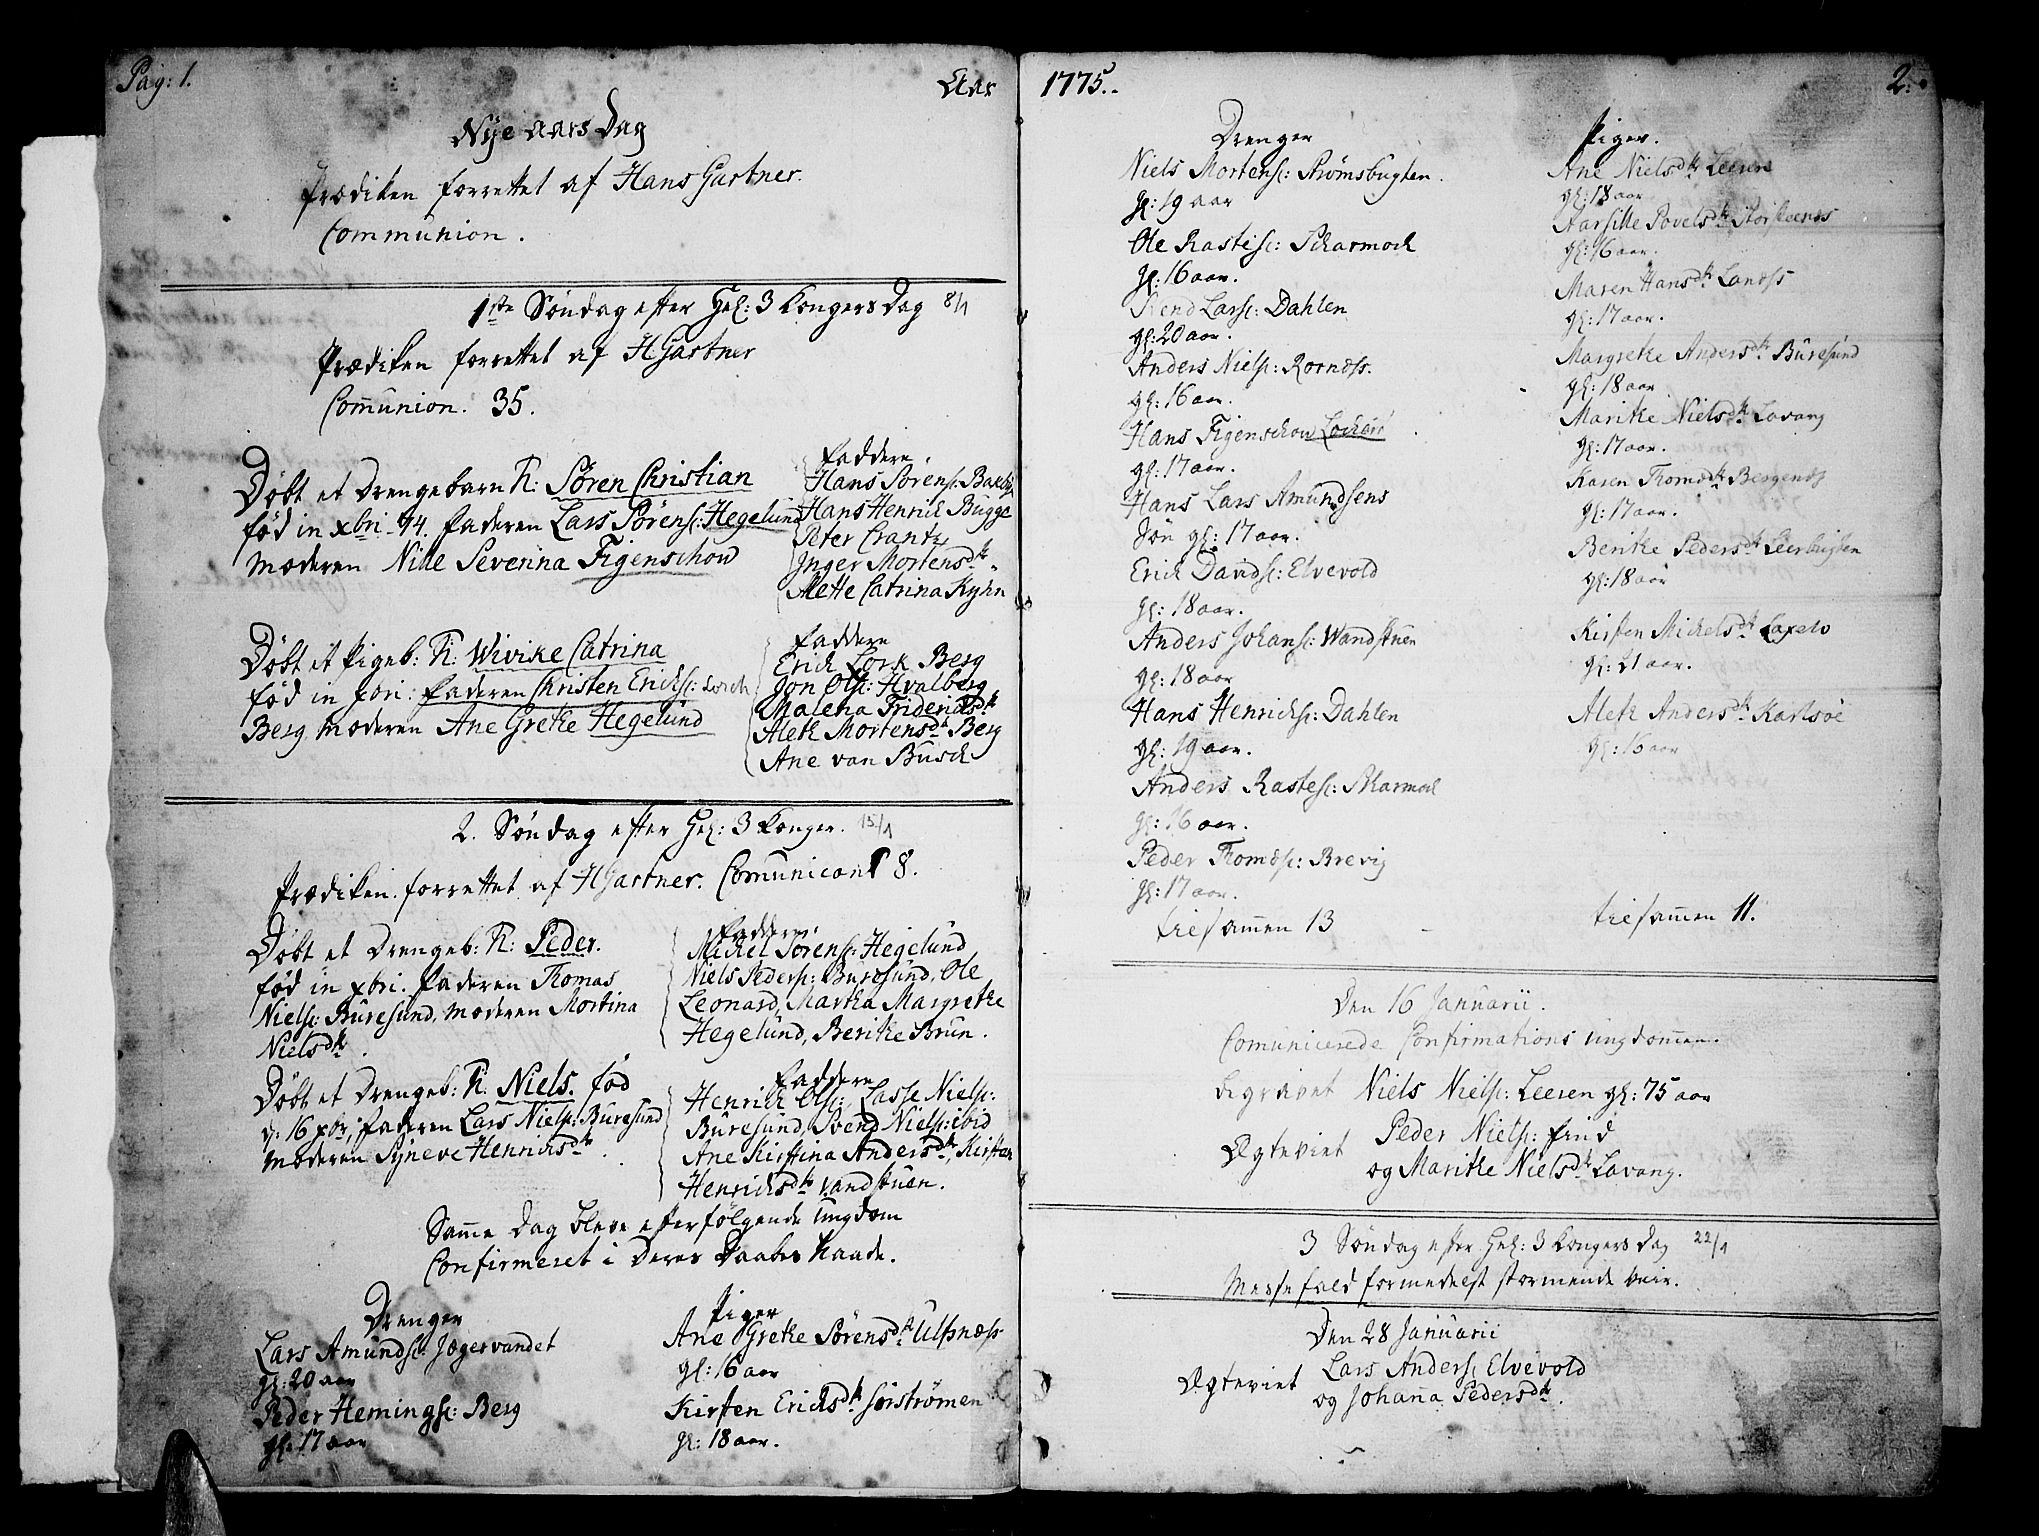 SATØ, Karlsøy sokneprestembete, H/Ha/Haa/L0001kirke: Ministerialbok nr. 1, 1775-1823, s. 1-2